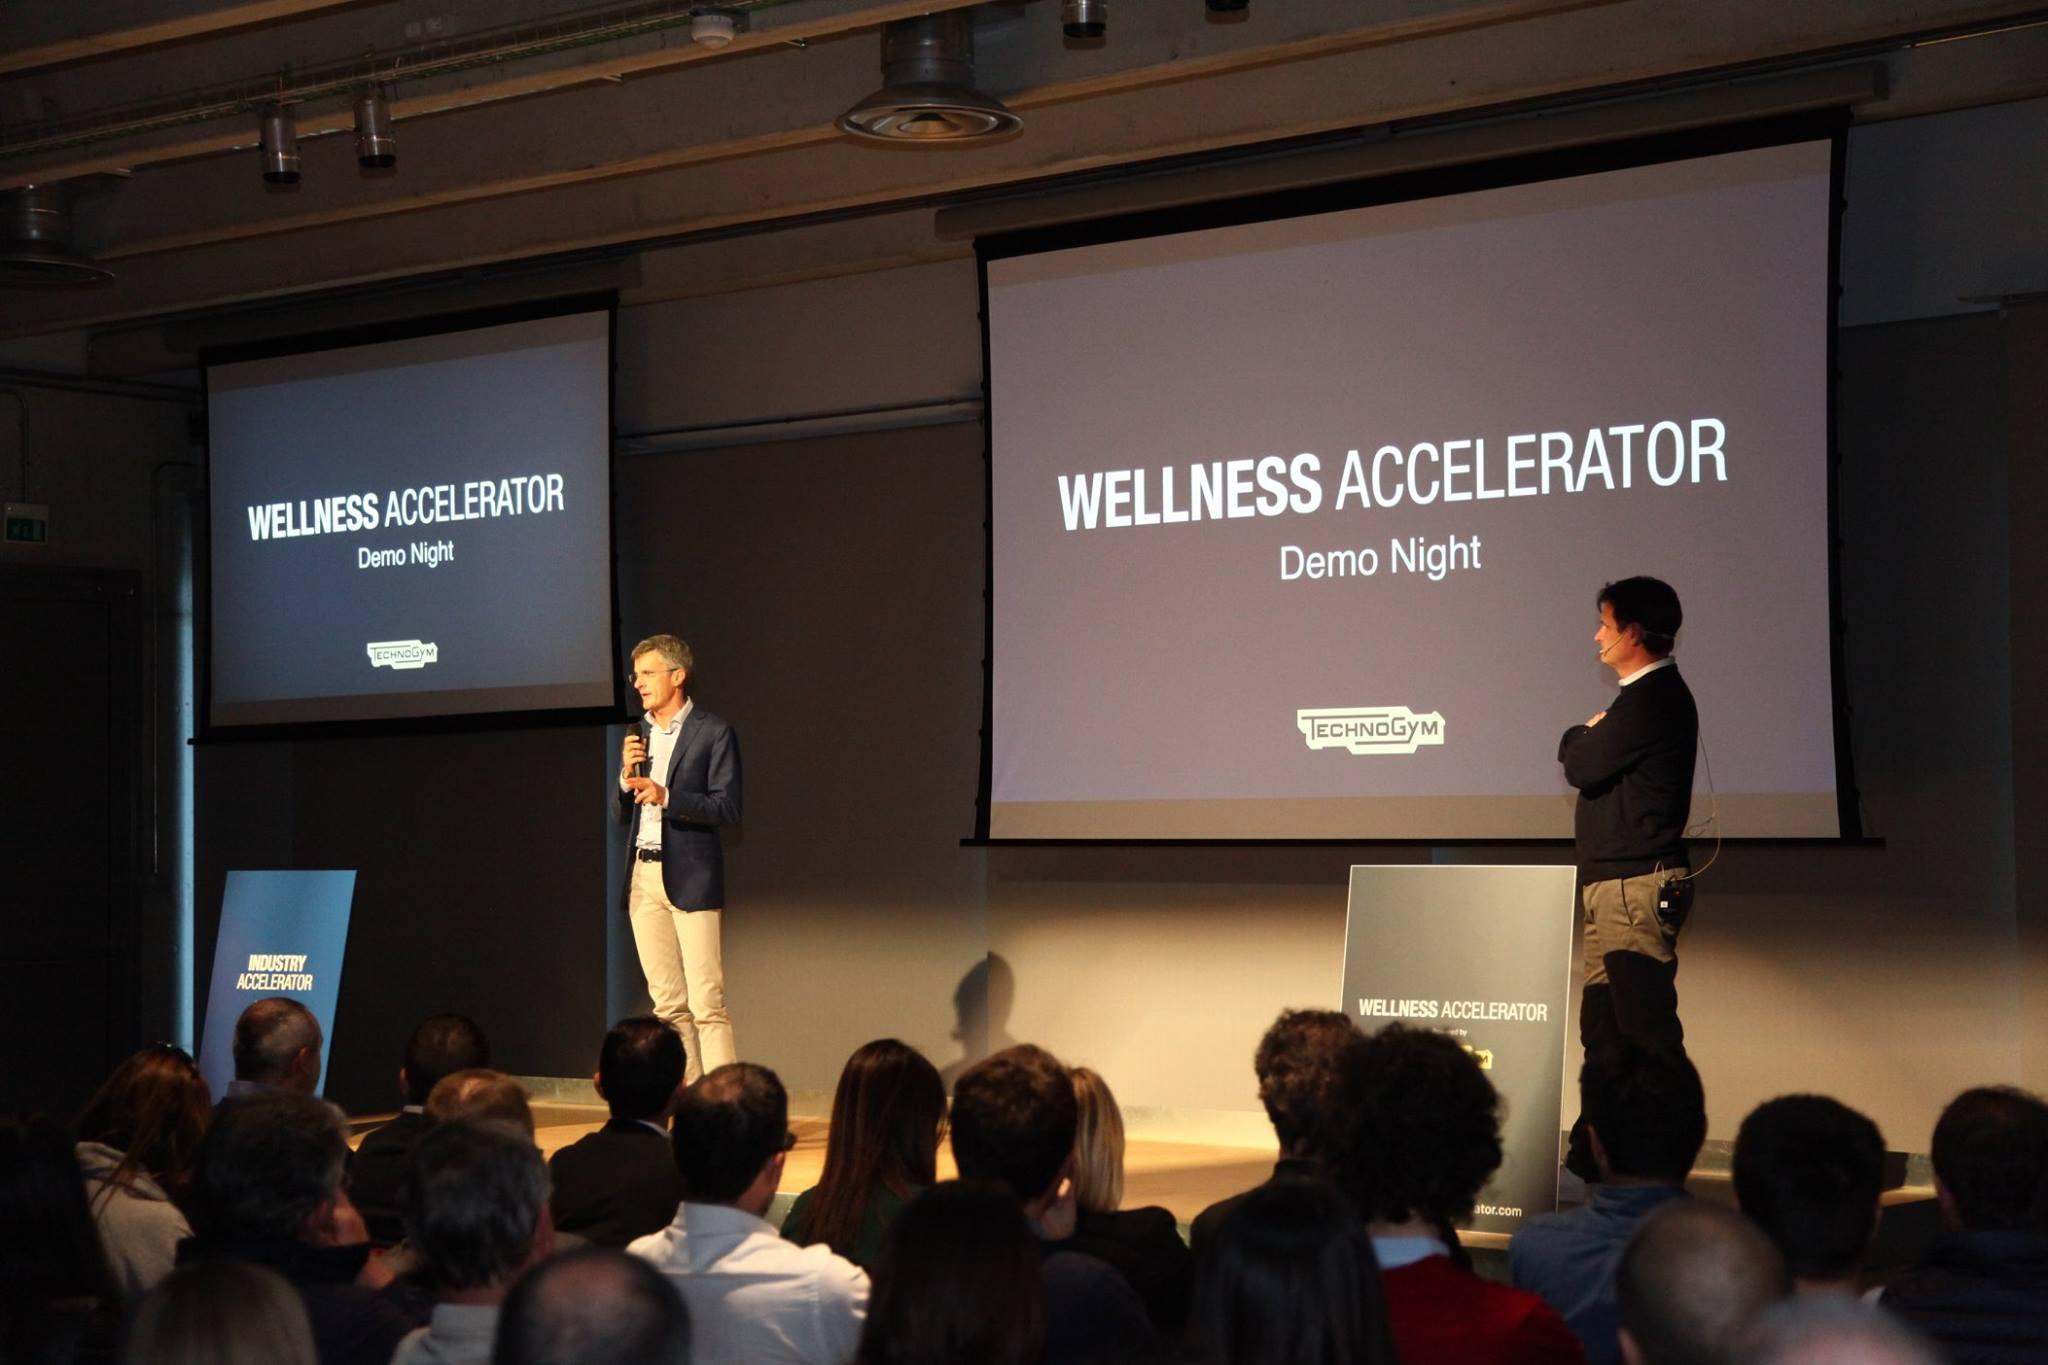 wellness accelerator